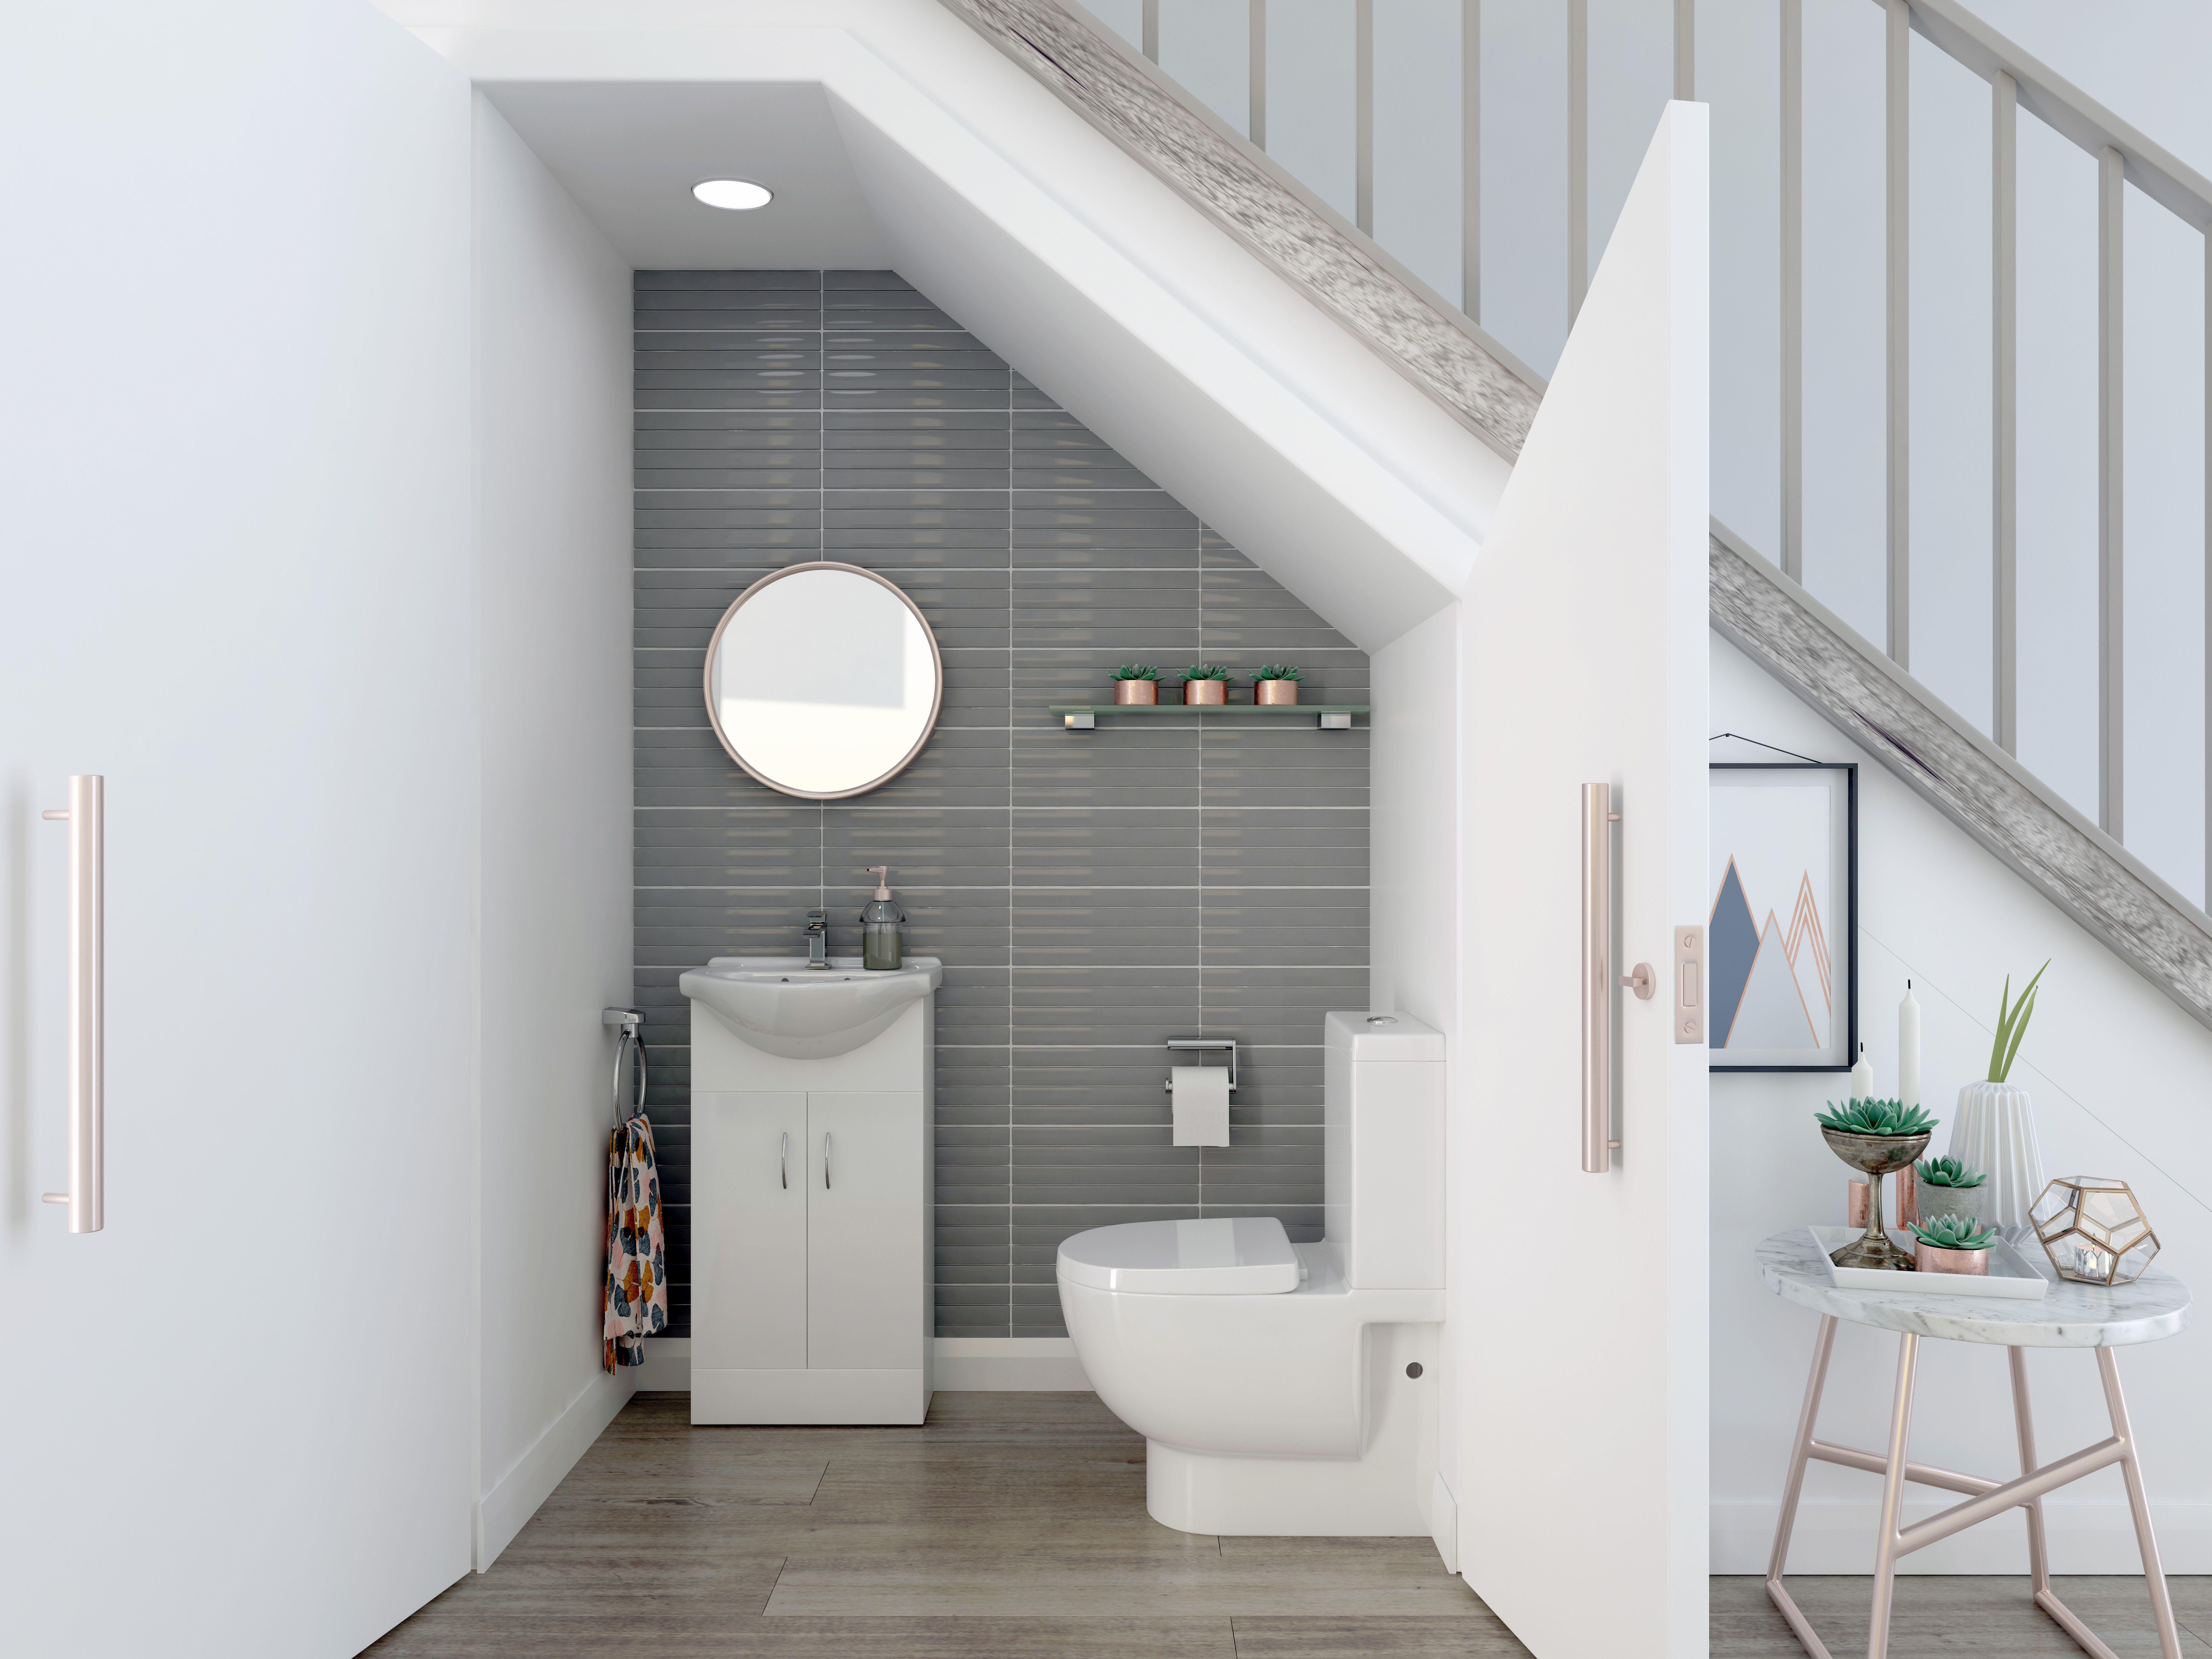 Lighting Basement Washroom Stairs: Inspiration From Bathrooms.com: Buy This Amazing Vanity 2